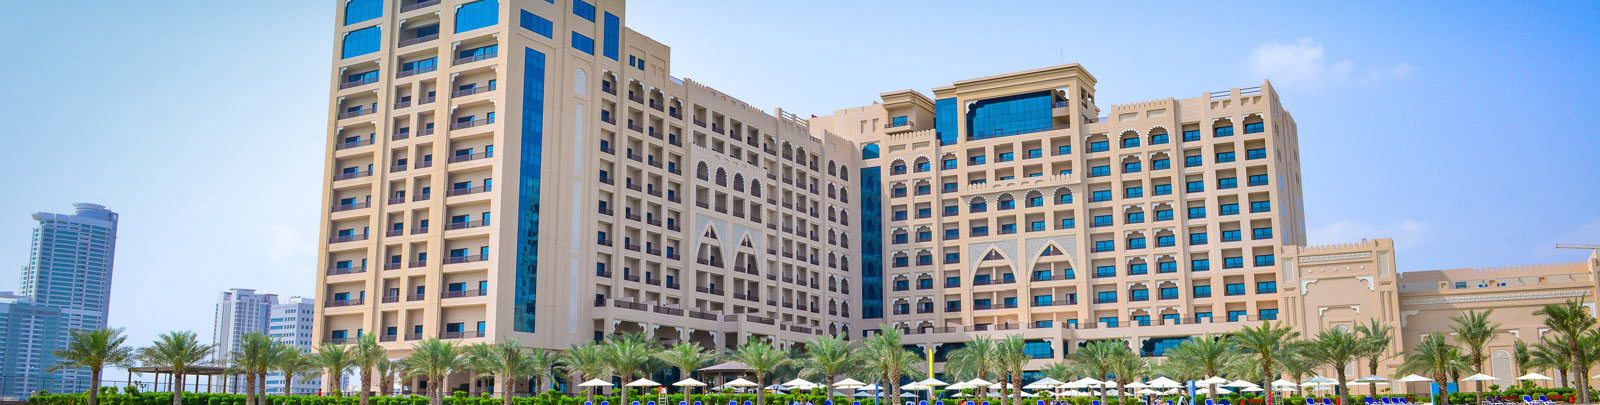 Fujairah Hotels United Arab Emirates Bluebay Hotels Resorts